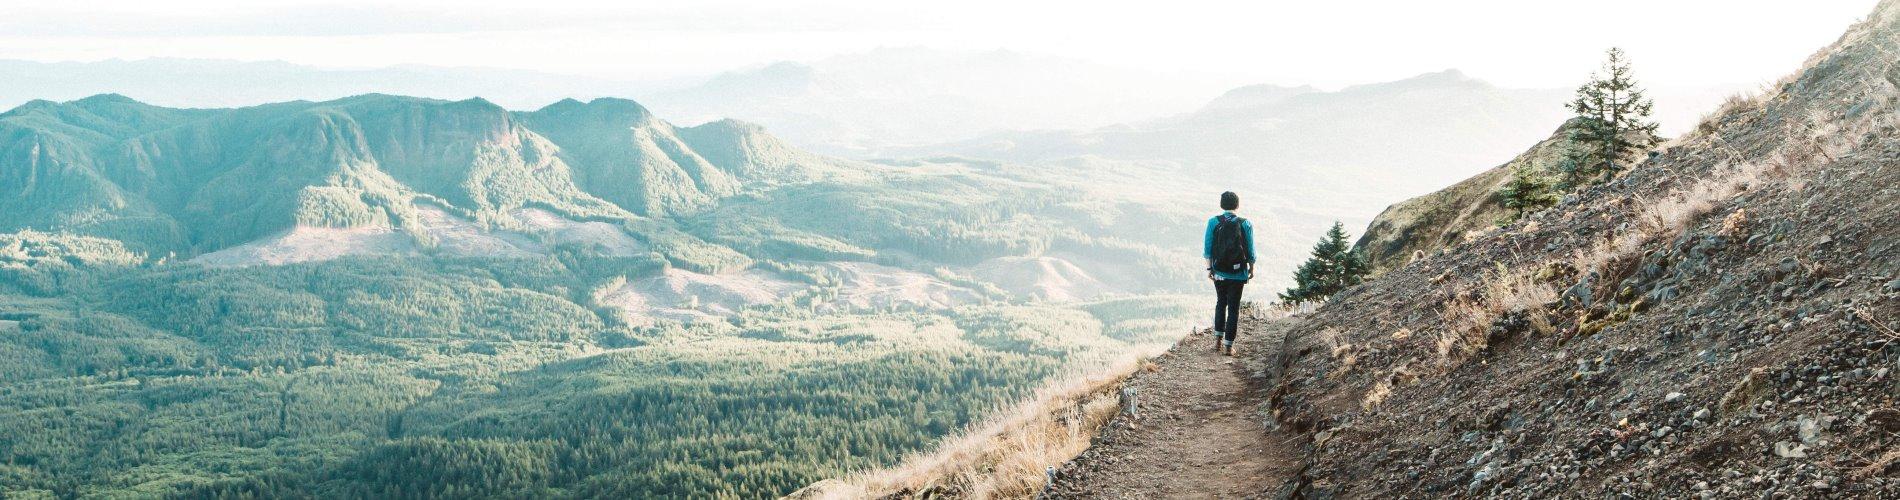 Fernwanderwege.net